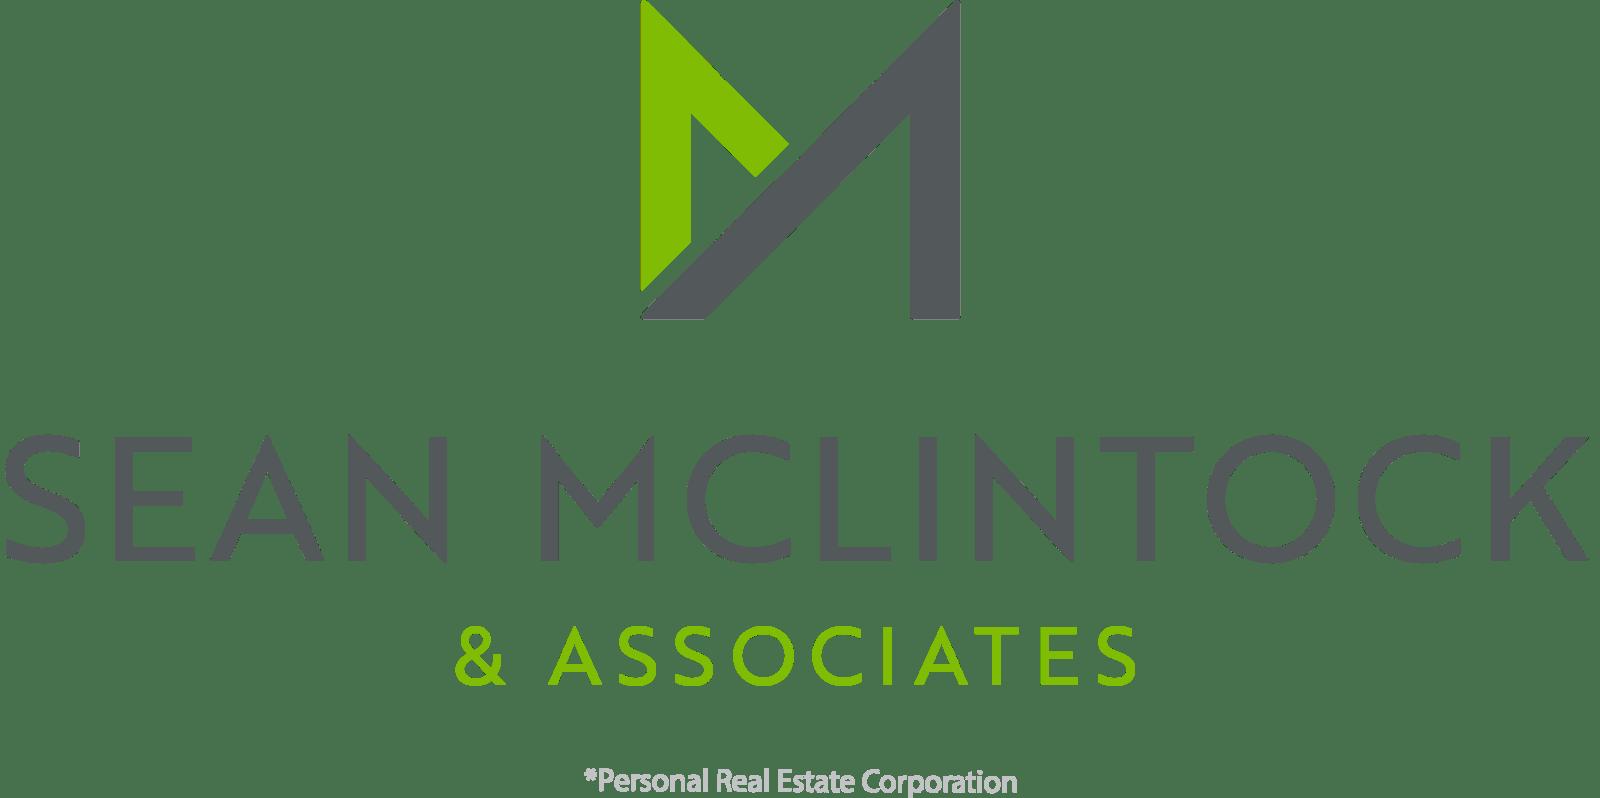 Sean McLintock & Associates